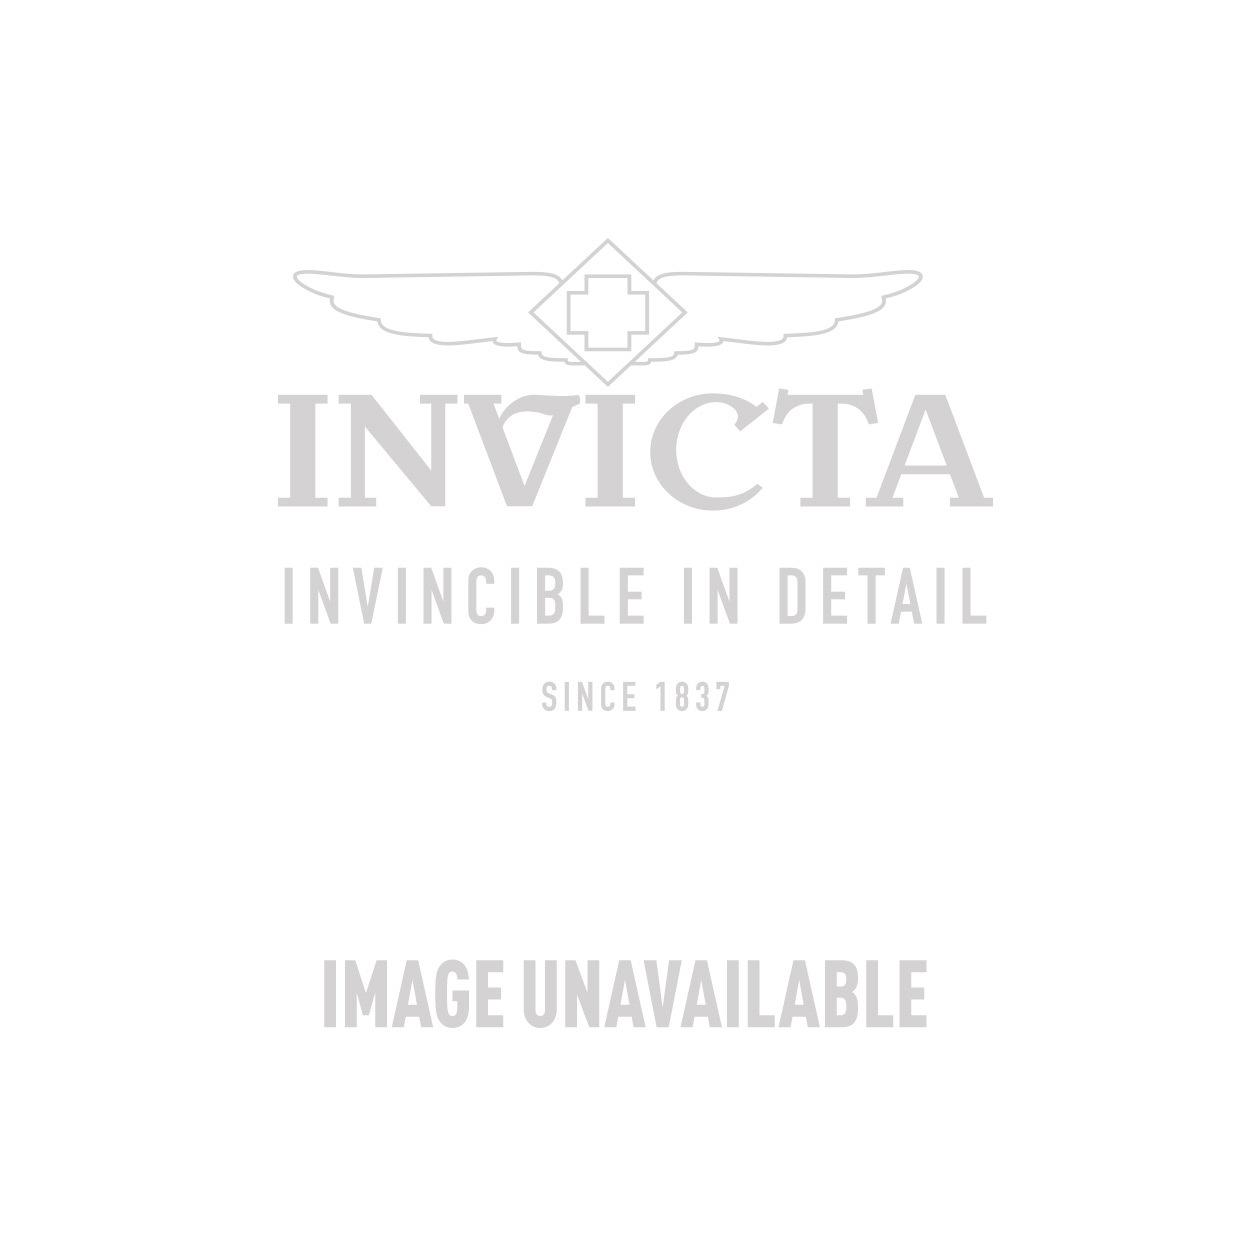 Invicta Aviator watch in Gunmetal 624e97ab7